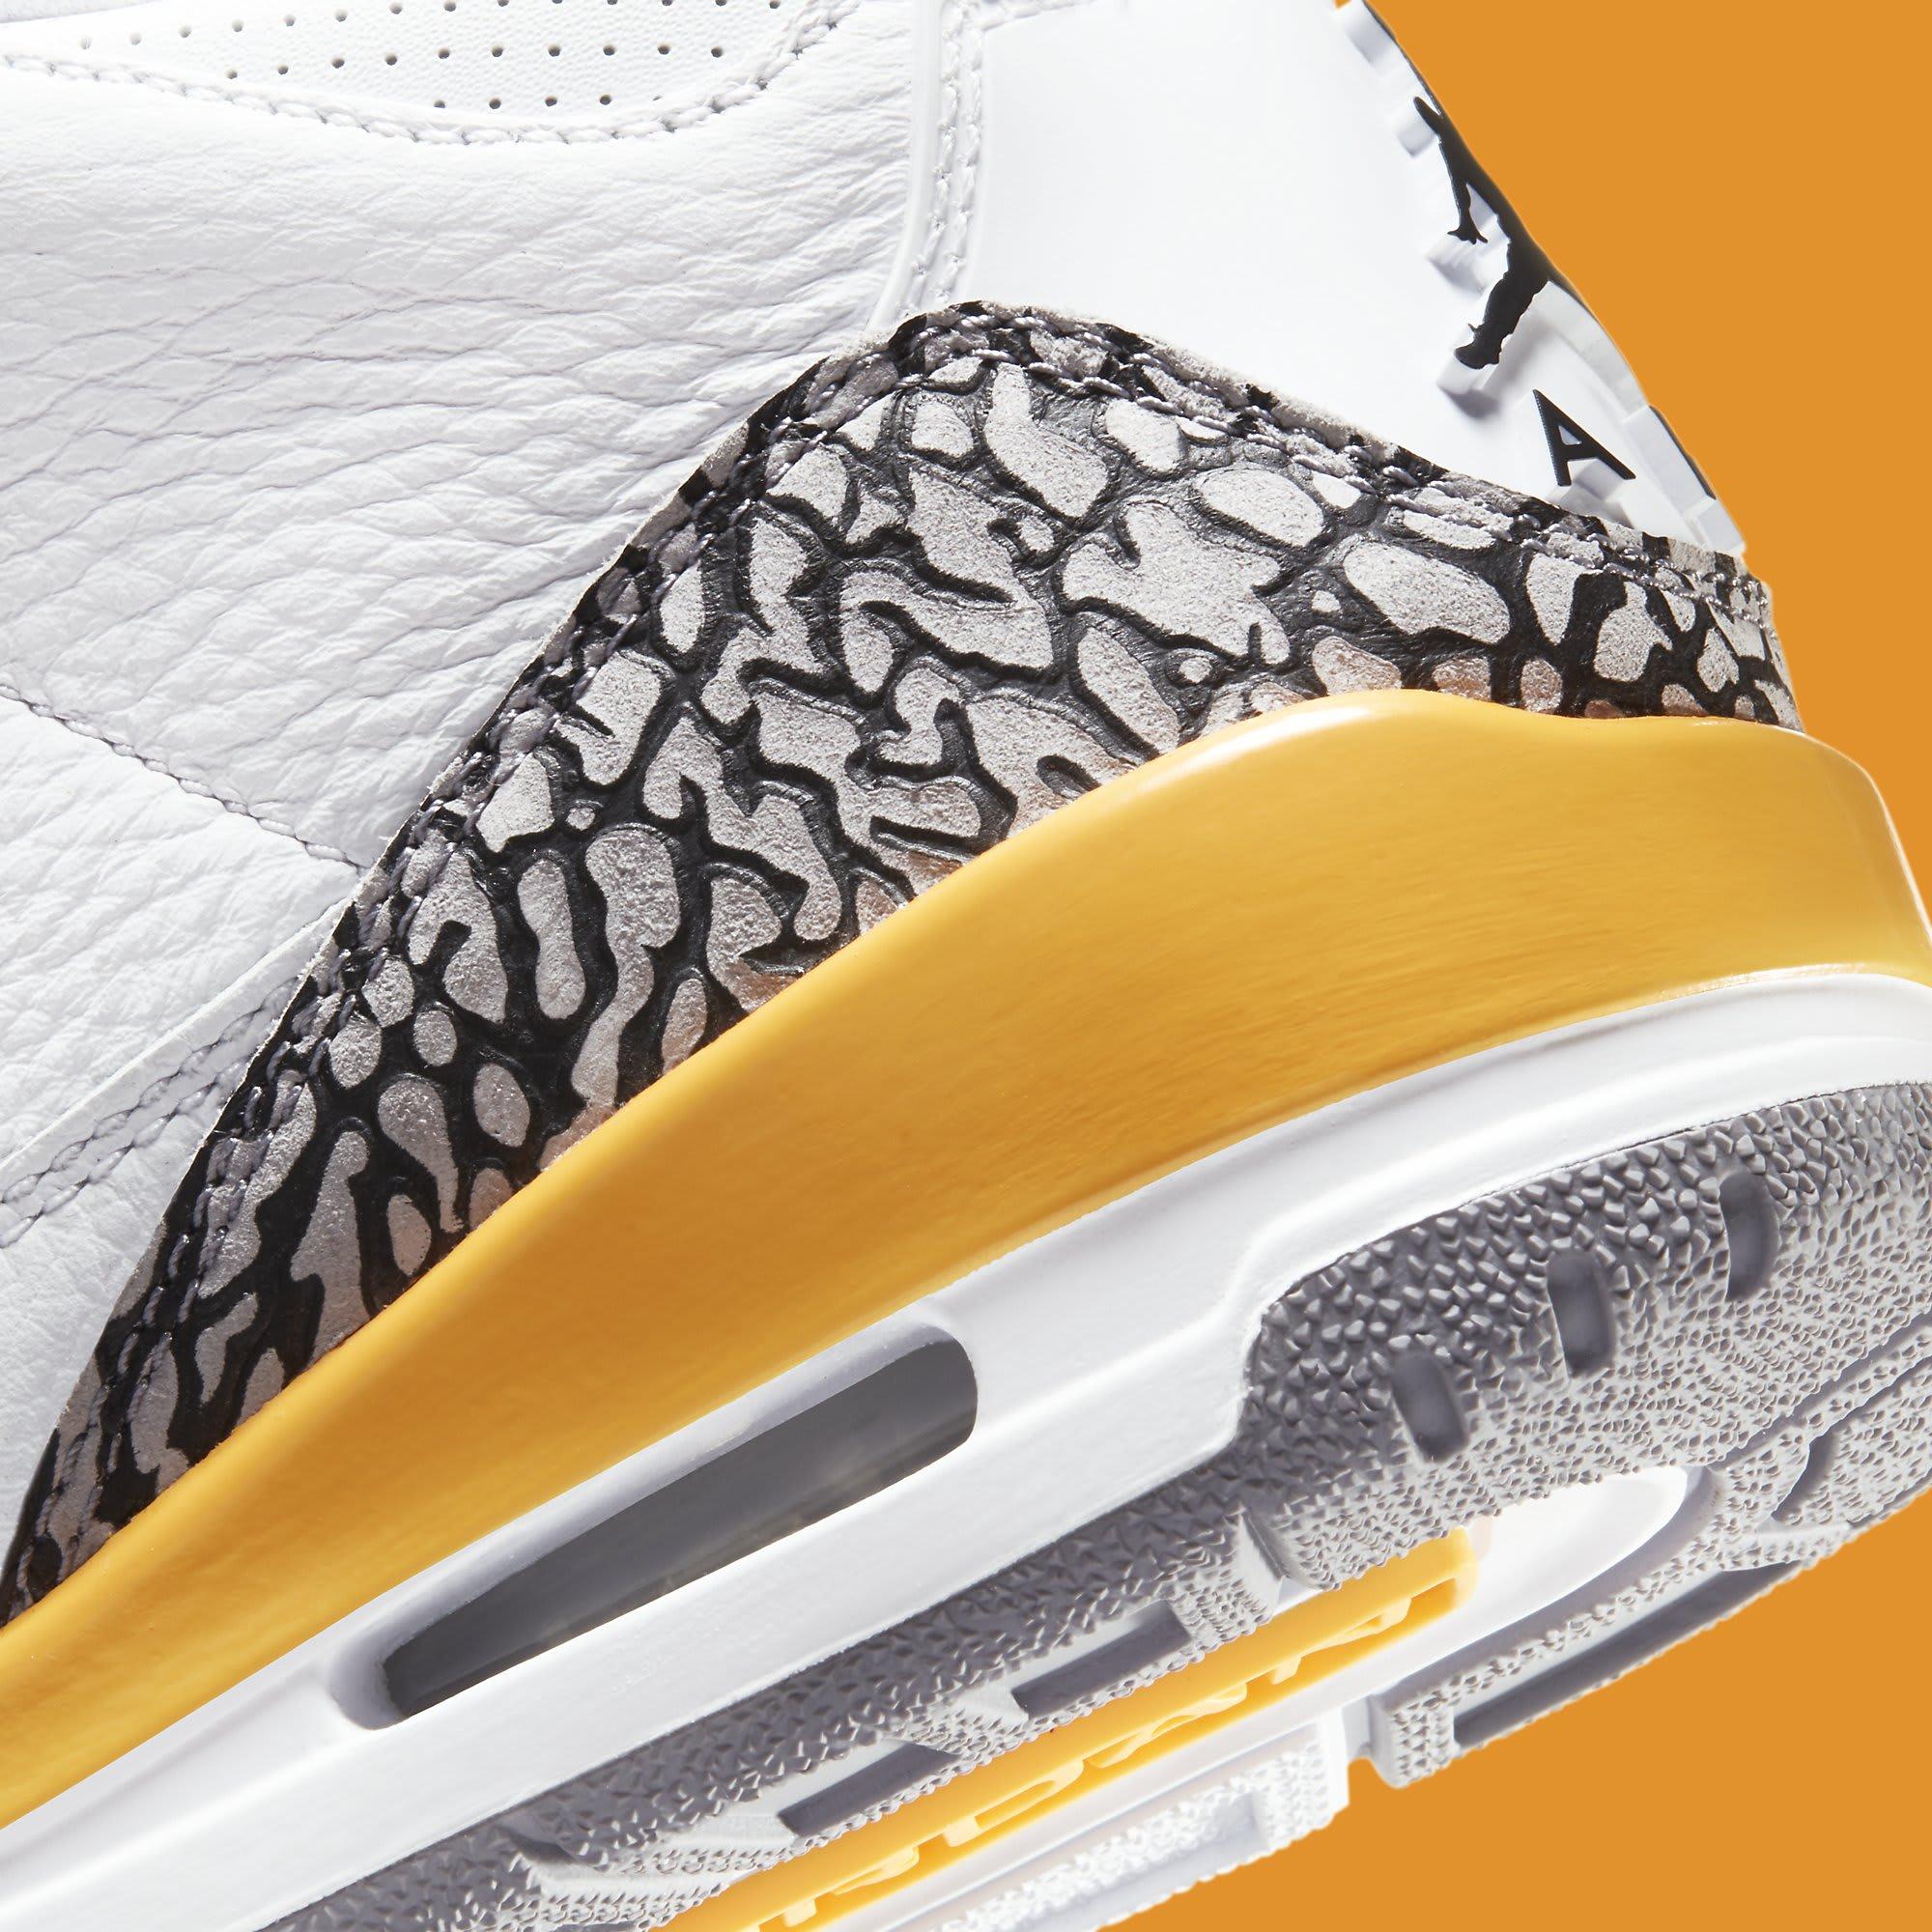 Air Jordan 3 III Laser Orange Release Date CK9246-108 Heel Detail